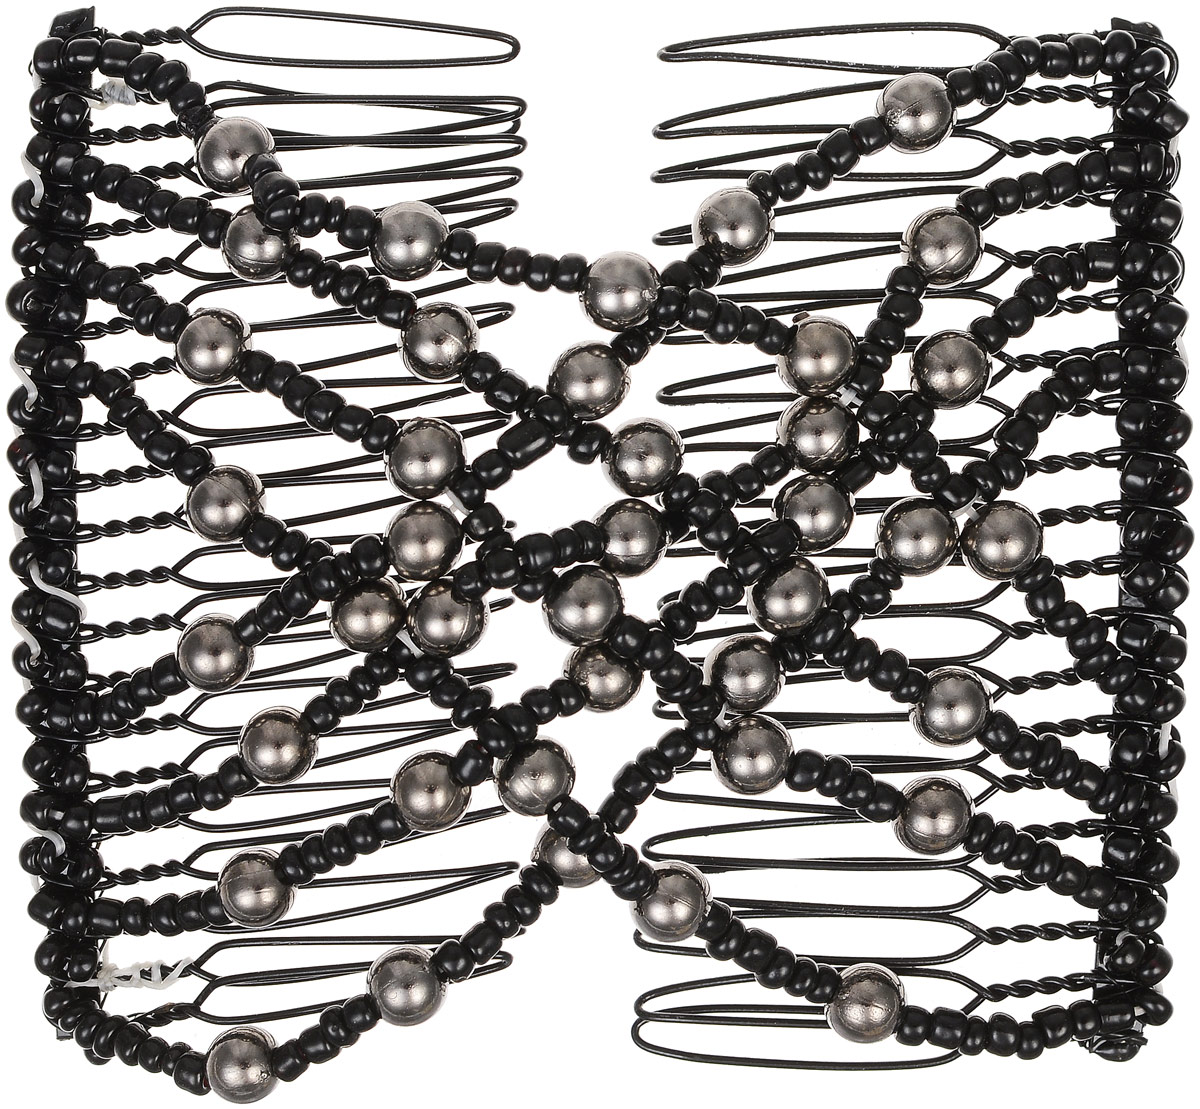 EZ-Combs Заколка Изи-Комбс, одинарная, цвет: черный, серебристый. ЗИО ez combs заколка изи комбс одинарная цвет коричневый зио сердечки